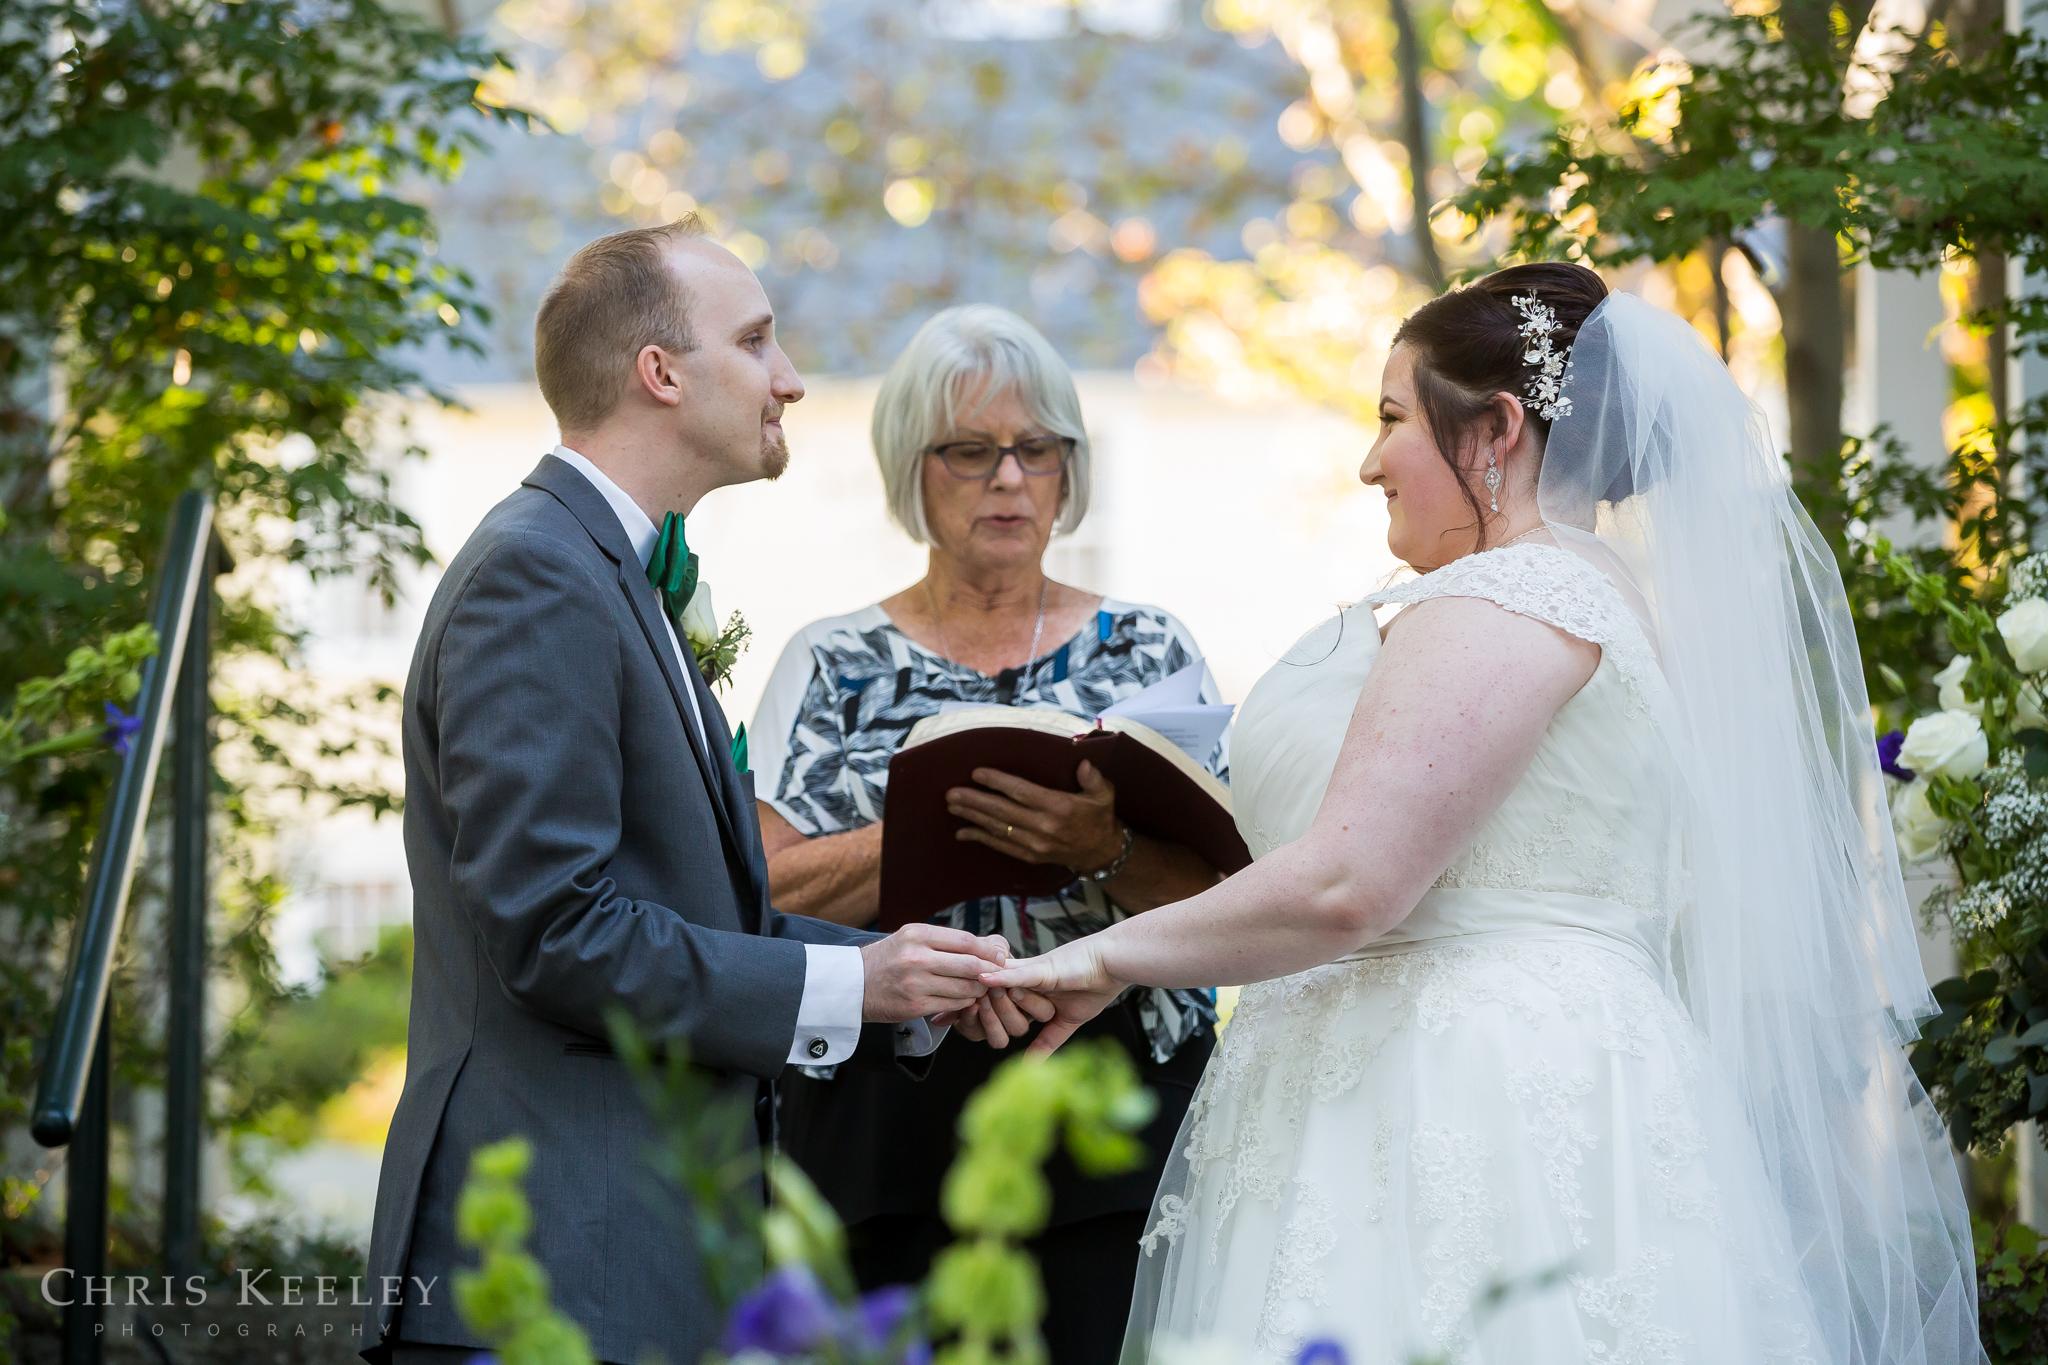 new-hampshire-wedding-photographer-three-chimneys-inn-chris-keeley-photography-16.jpg